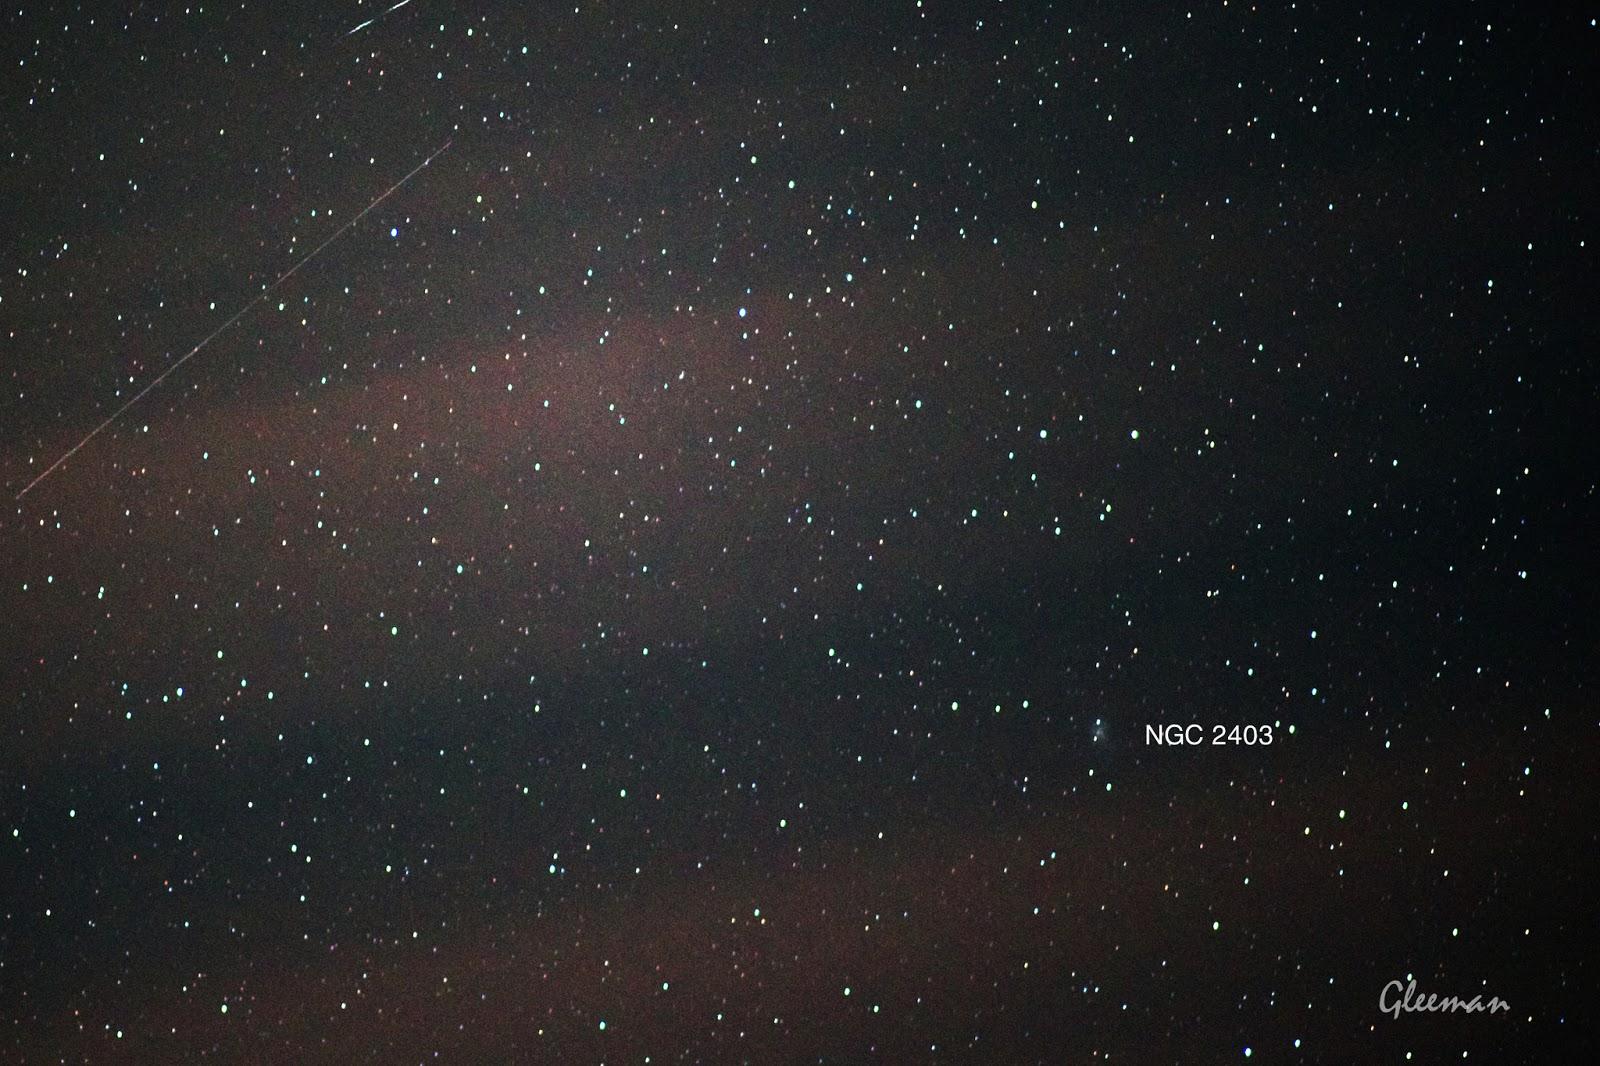 NGC 2403/ Pentax  K5 + Pentax O-GPS1 + DA*200